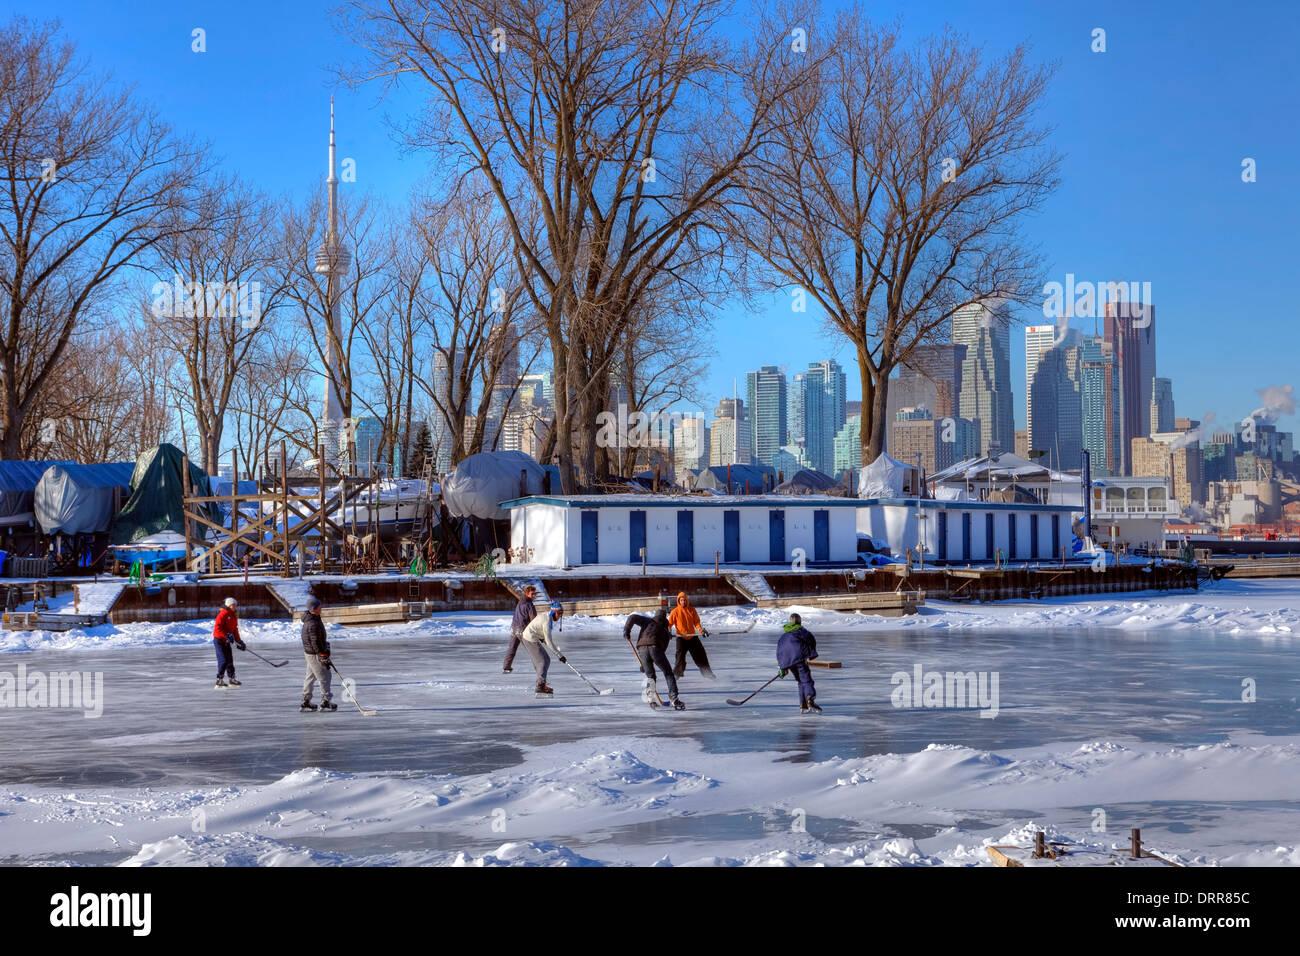 Hockey su ghiaccio, Toronto, Ontario, Canada Immagini Stock